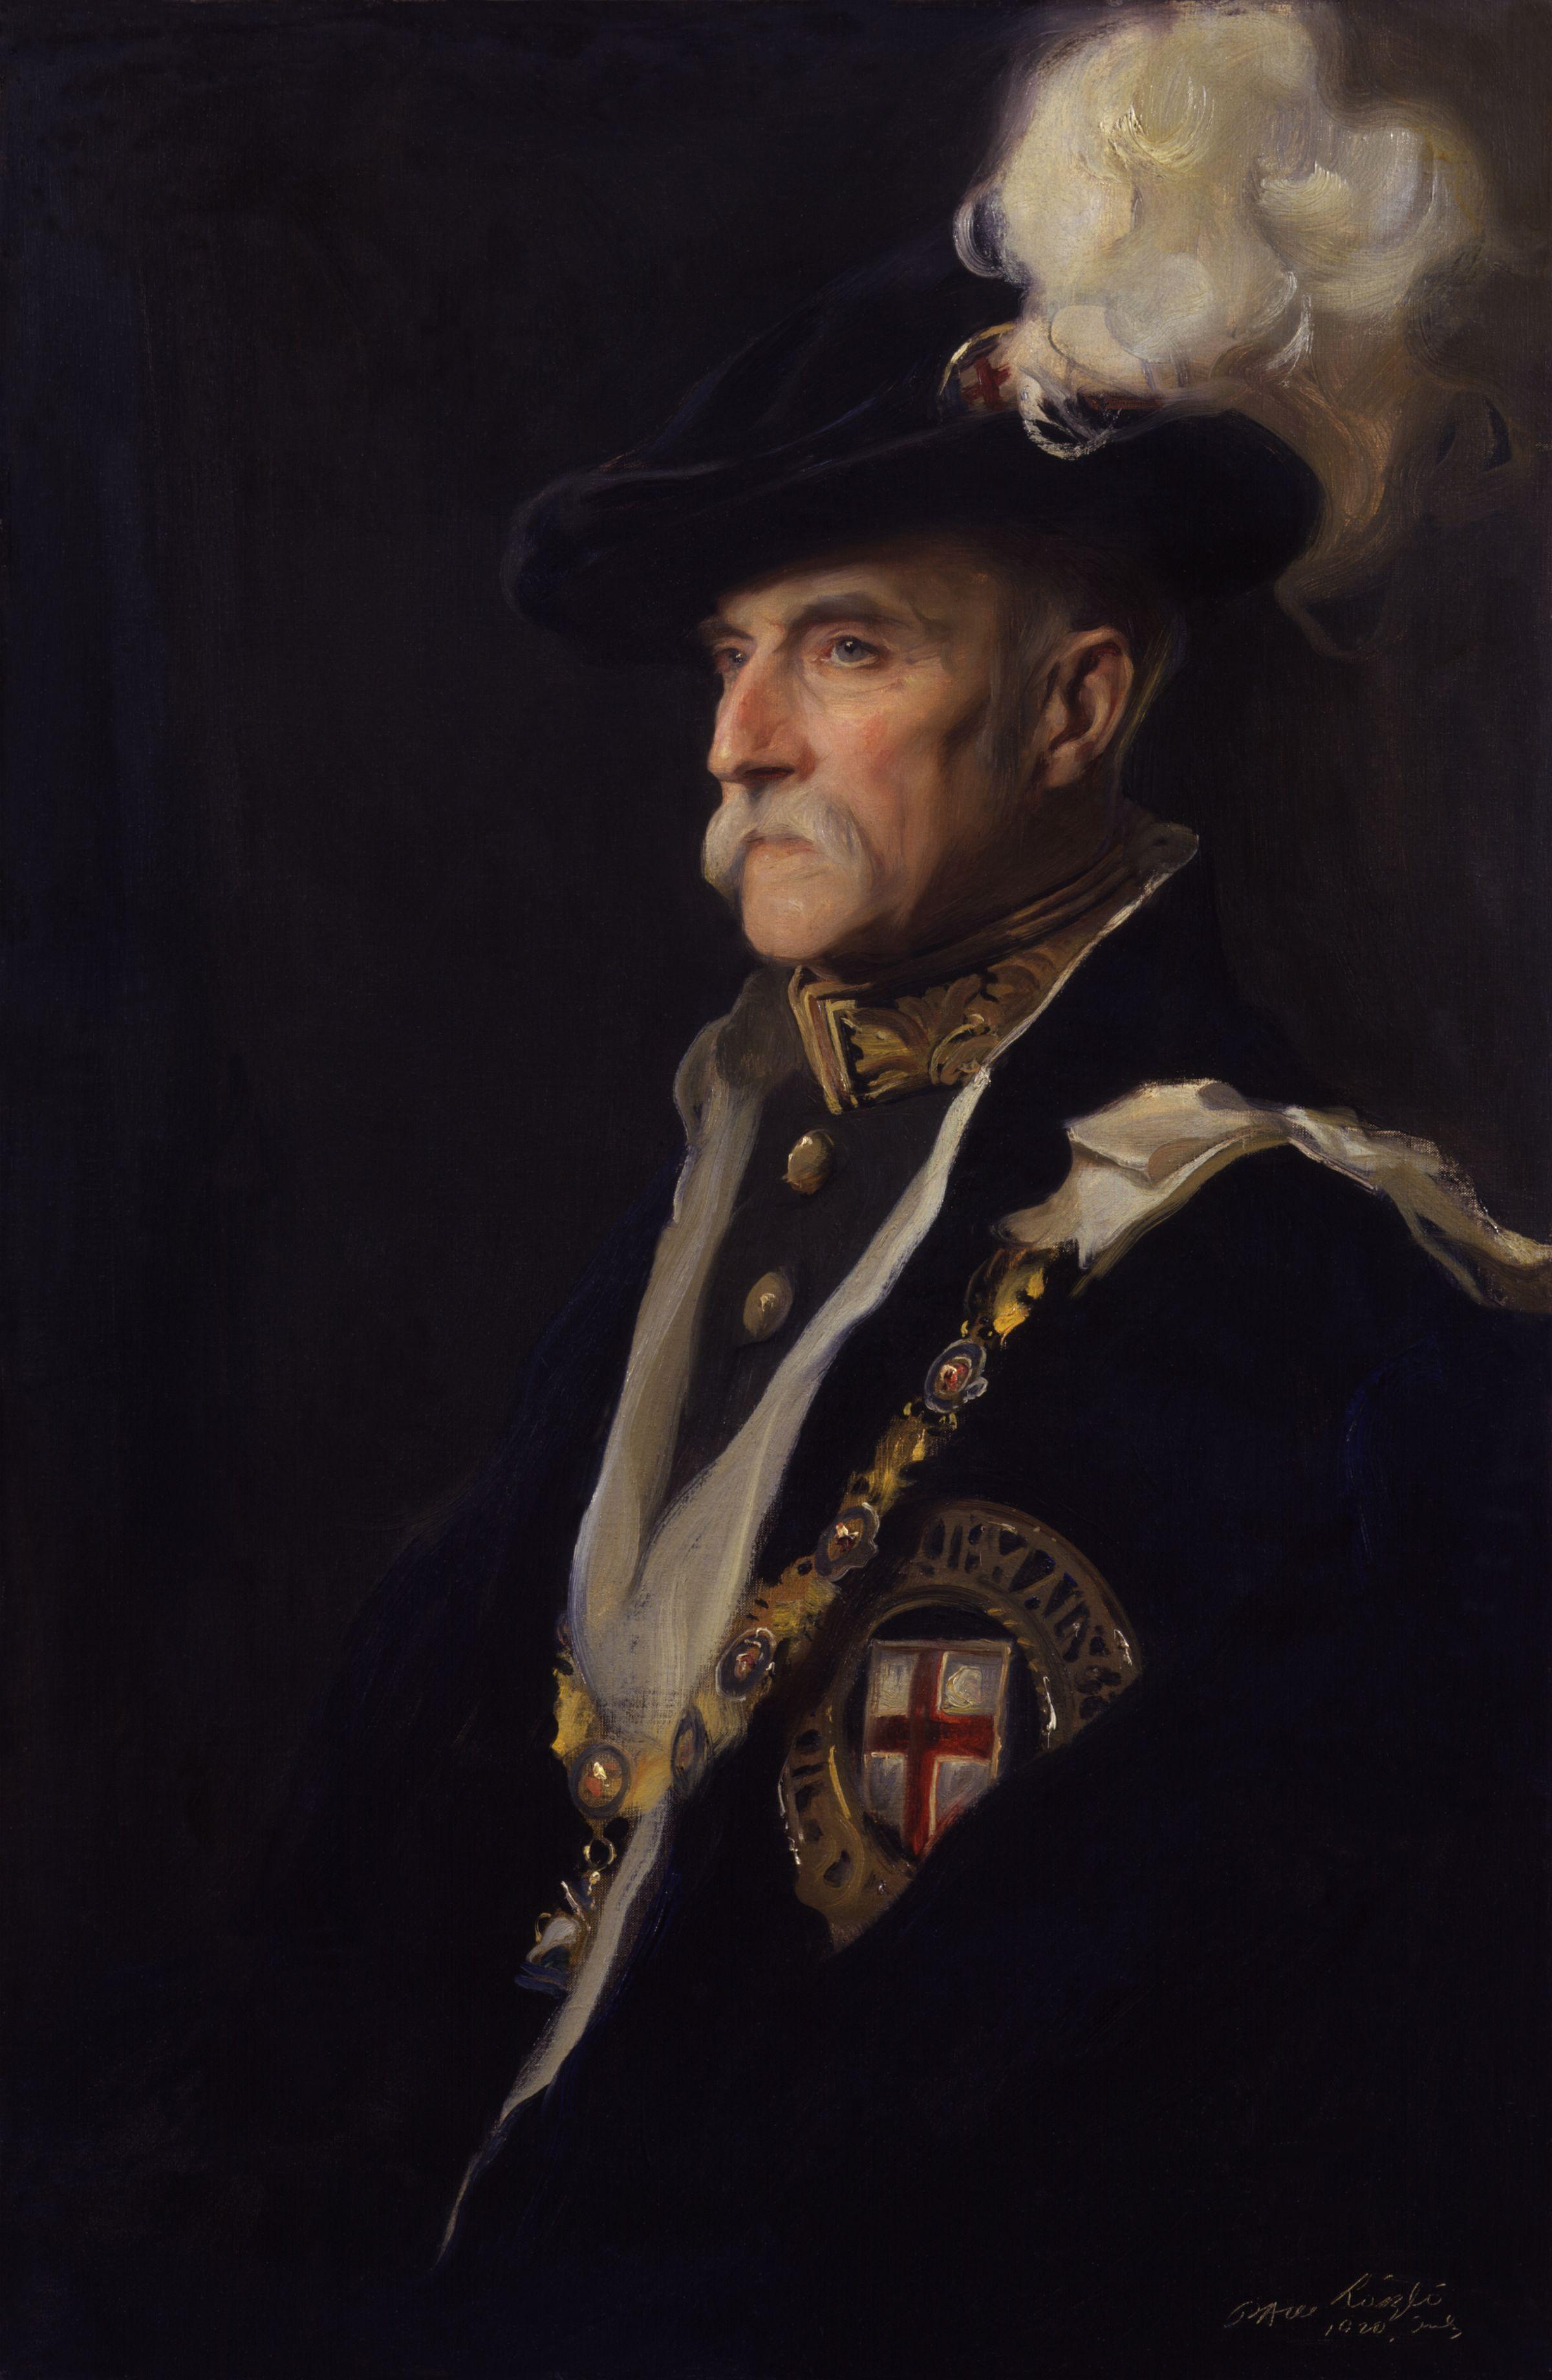 Lord Landsdowne